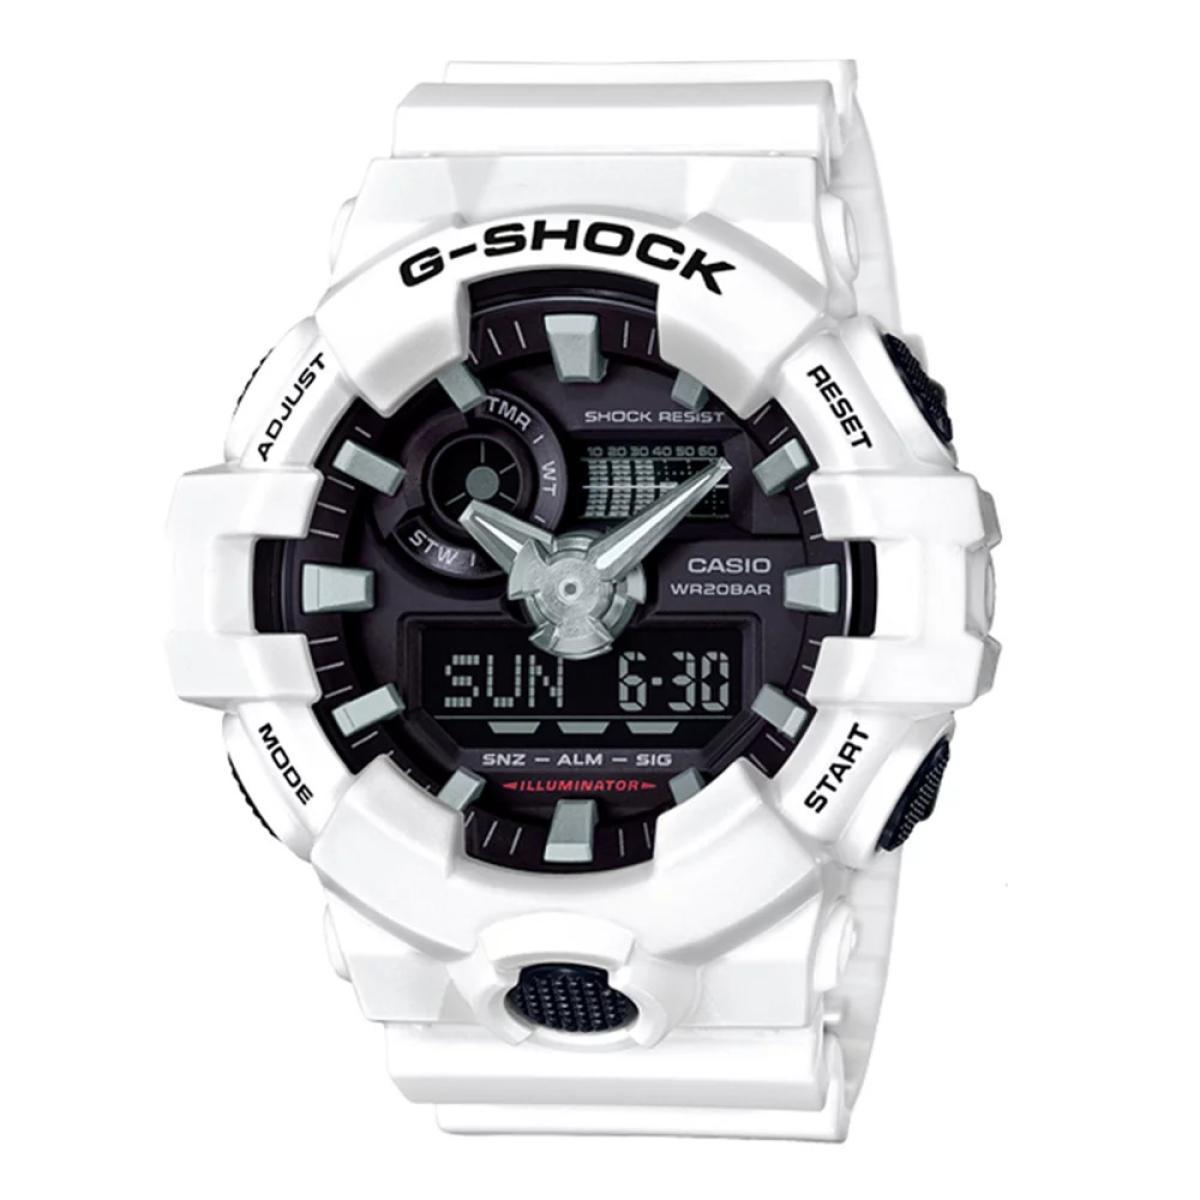 RELÓGIO CASIO G-SHOCK GA-700-7ADR